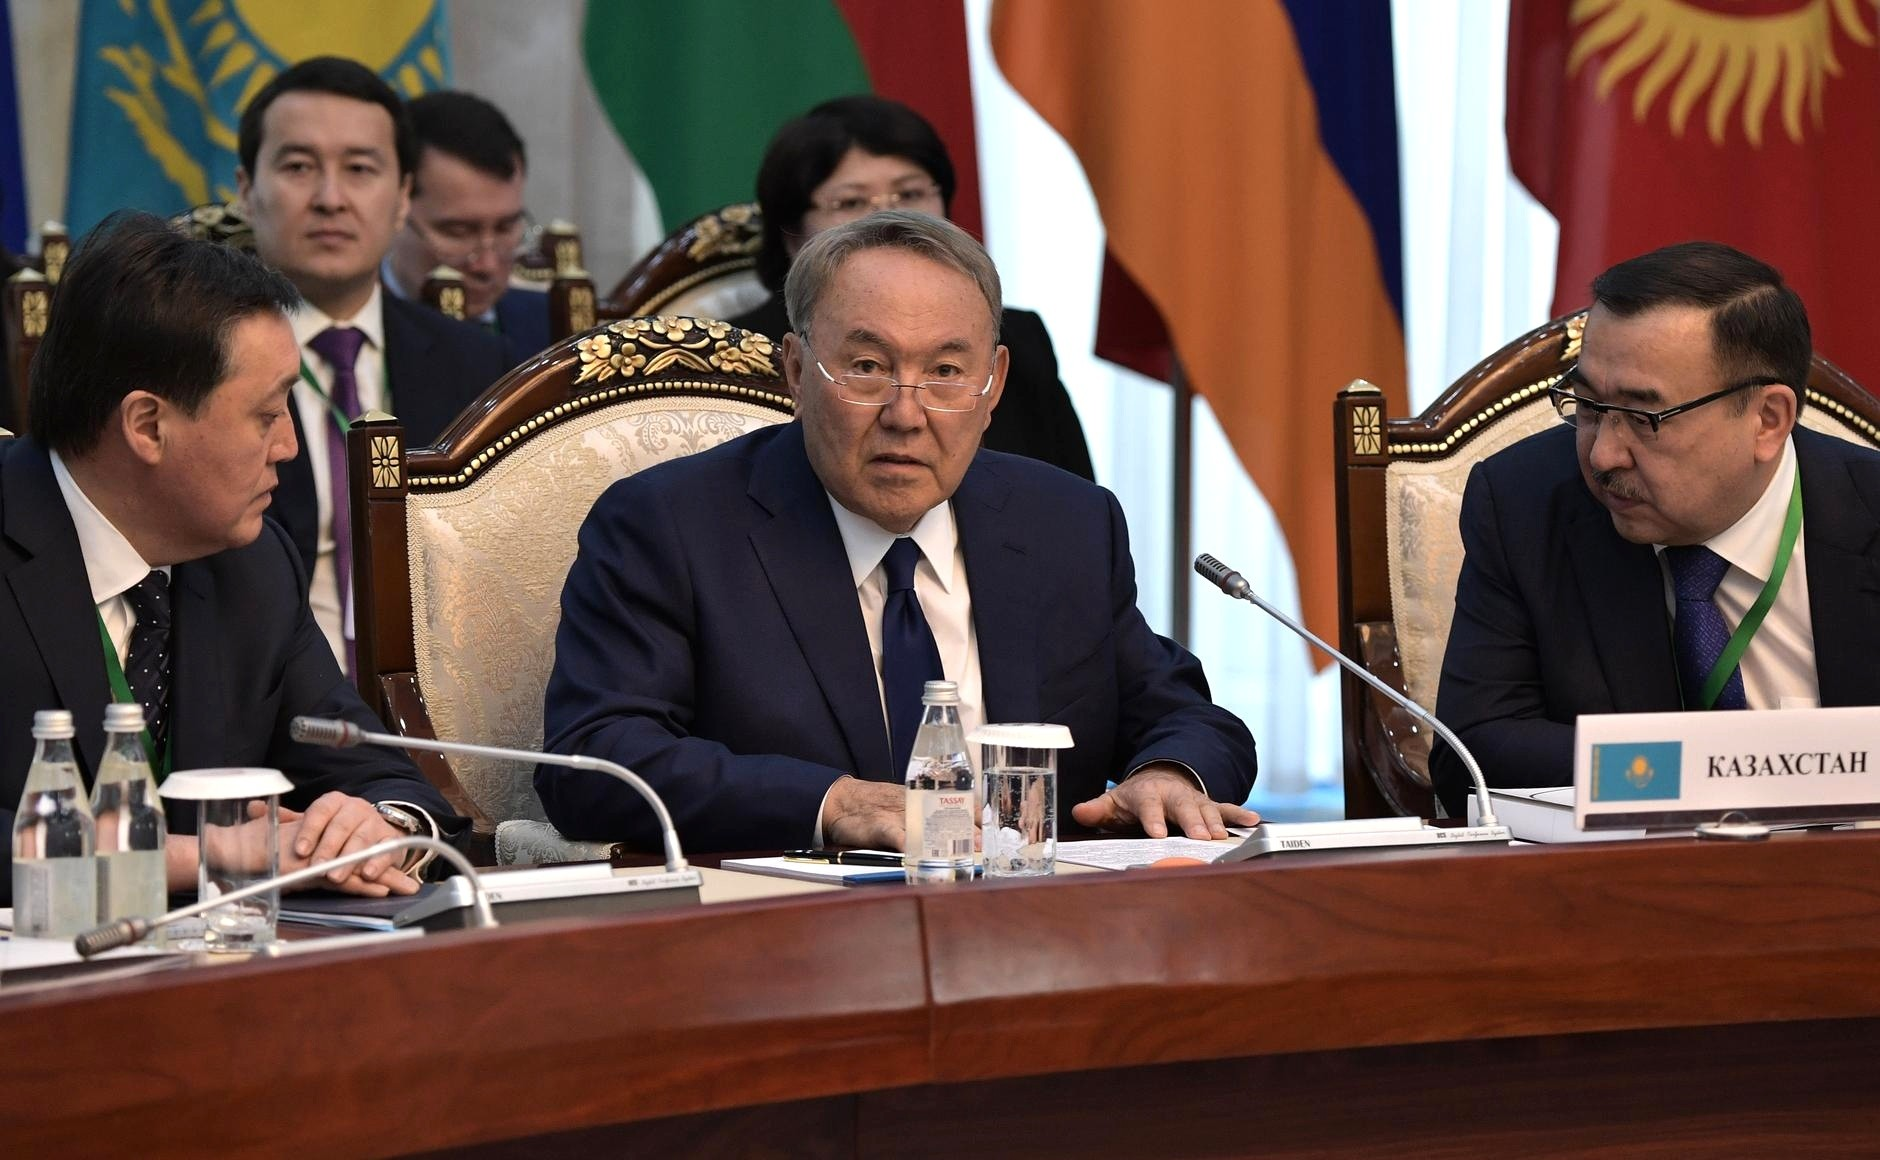 Noursoultan Nazarbaïev Union économique eurasiatique UEE Bichkek Kirghizstan Kazakhstan